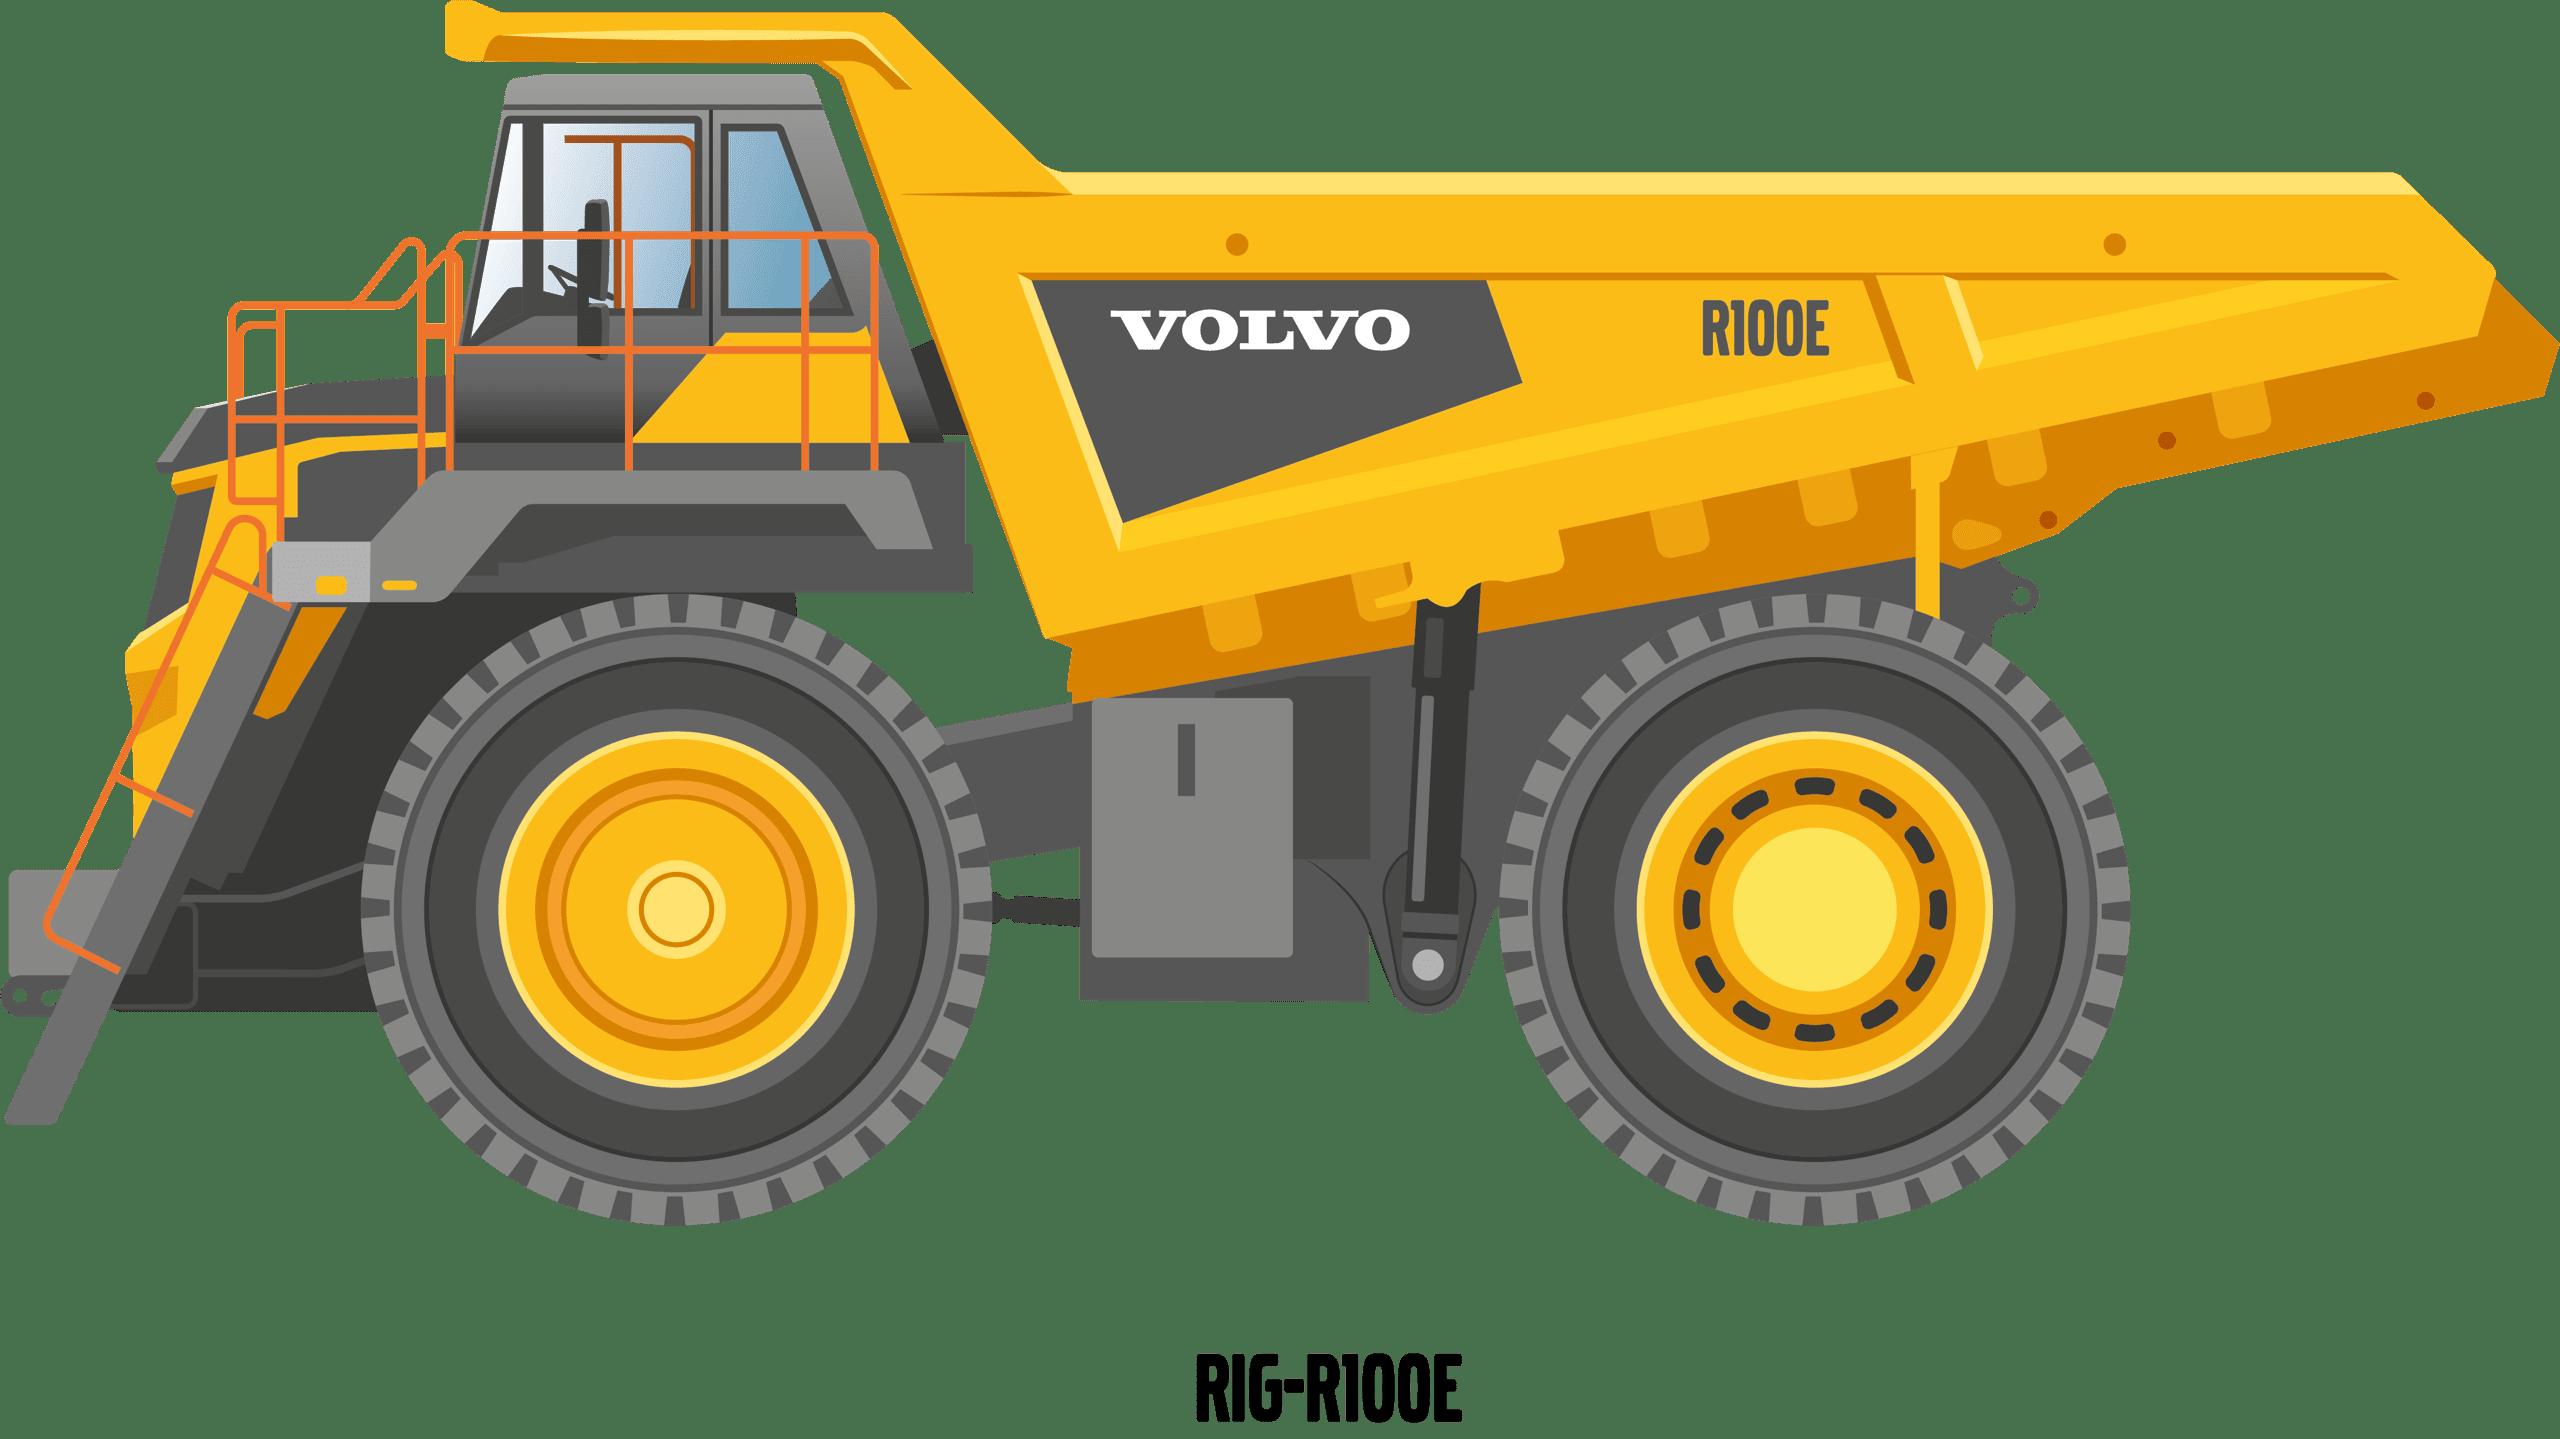 CJD-Rigid-Hauler-Volvo-R100E-2